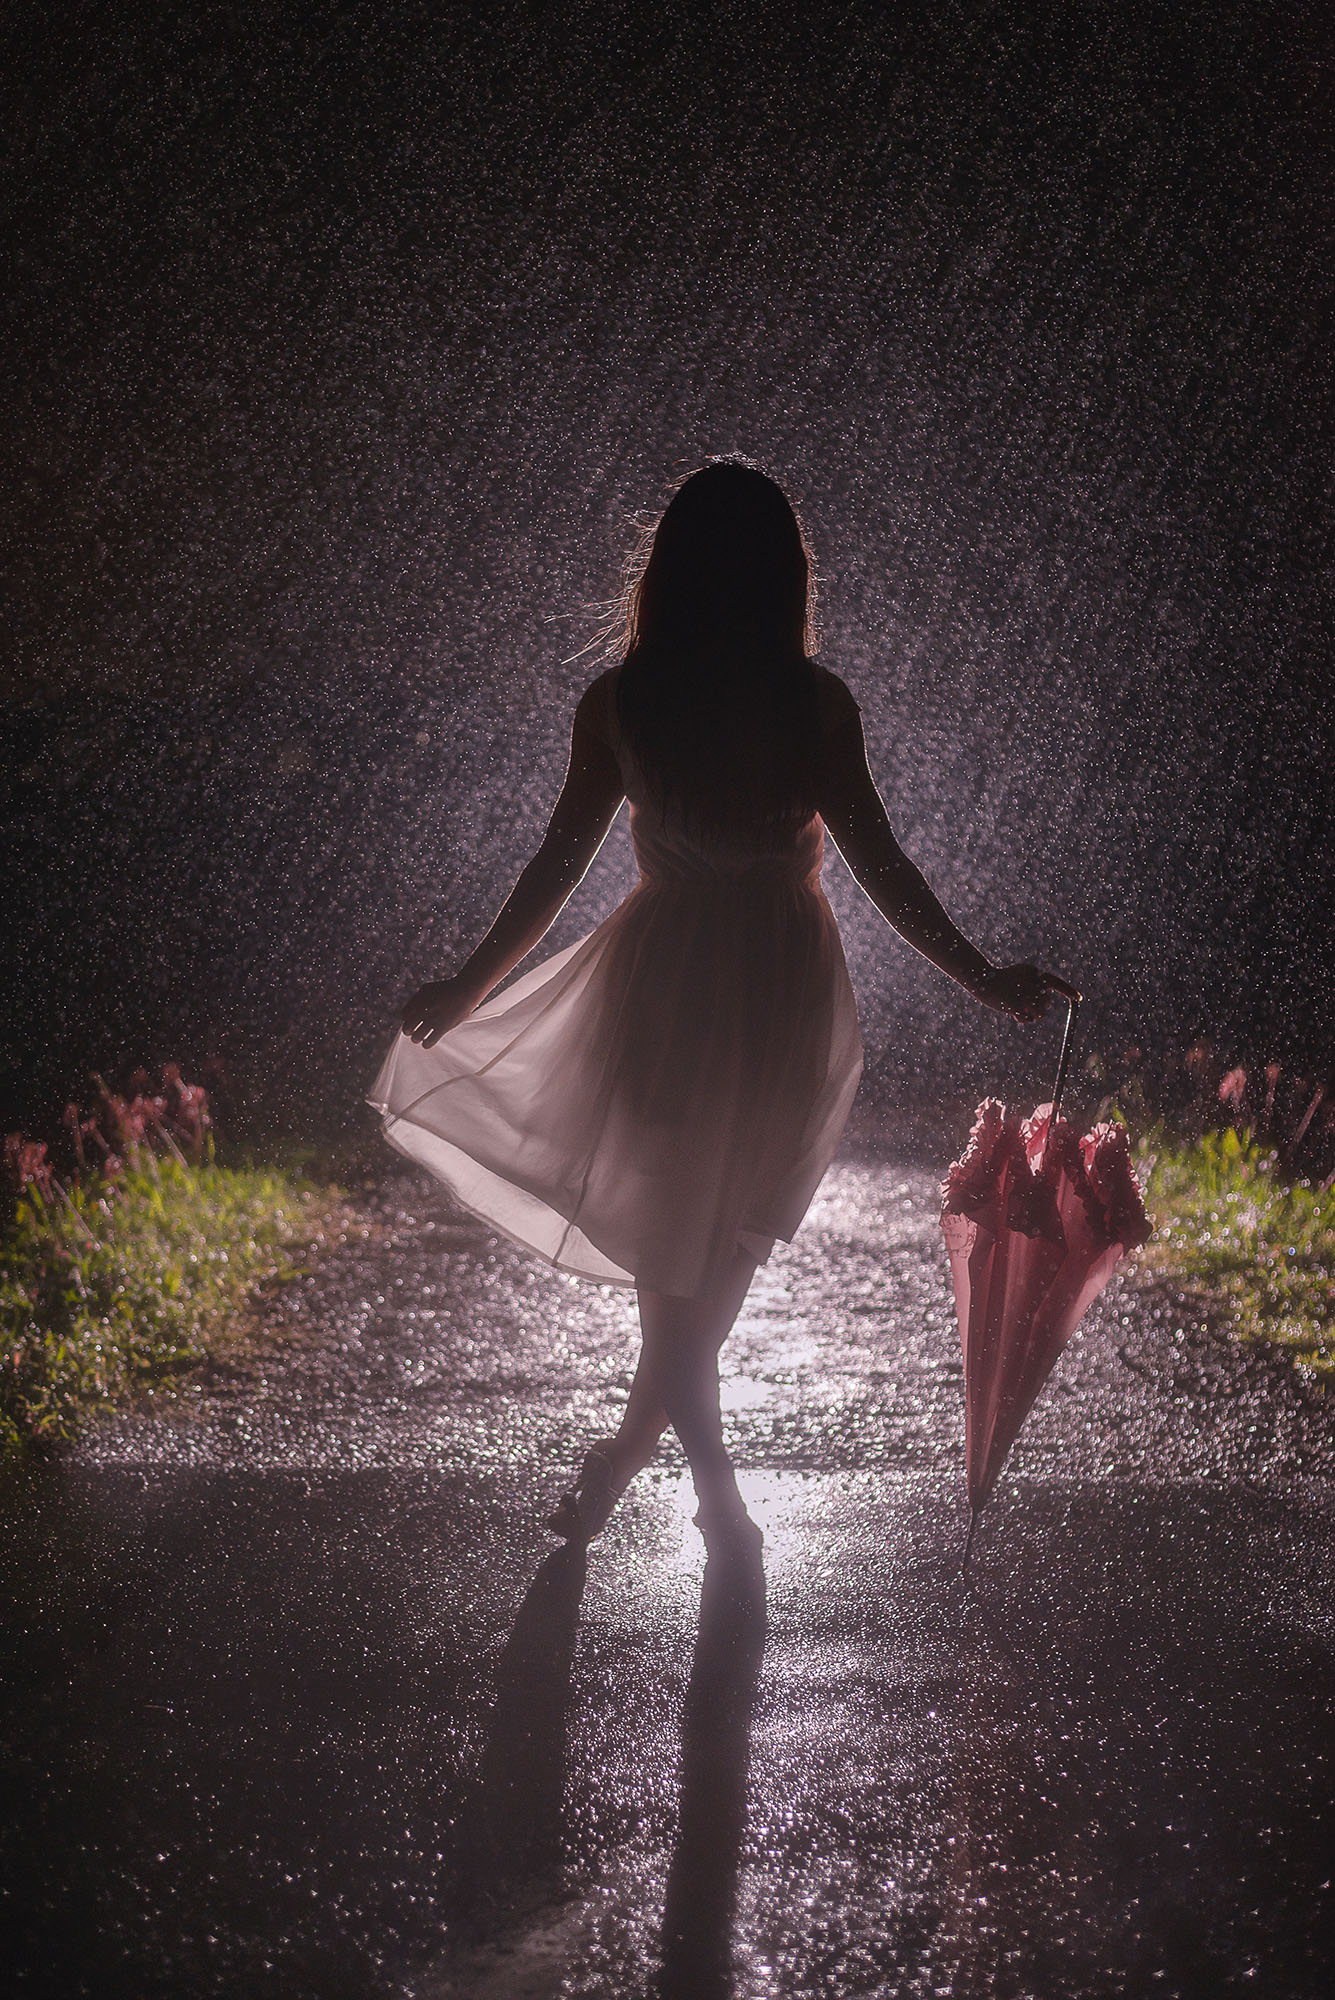 carving, photography, portrait, photo, woman, 写真、ポートレート、 美しい、 女性、雨ポートレート、rain portrait, night、夜